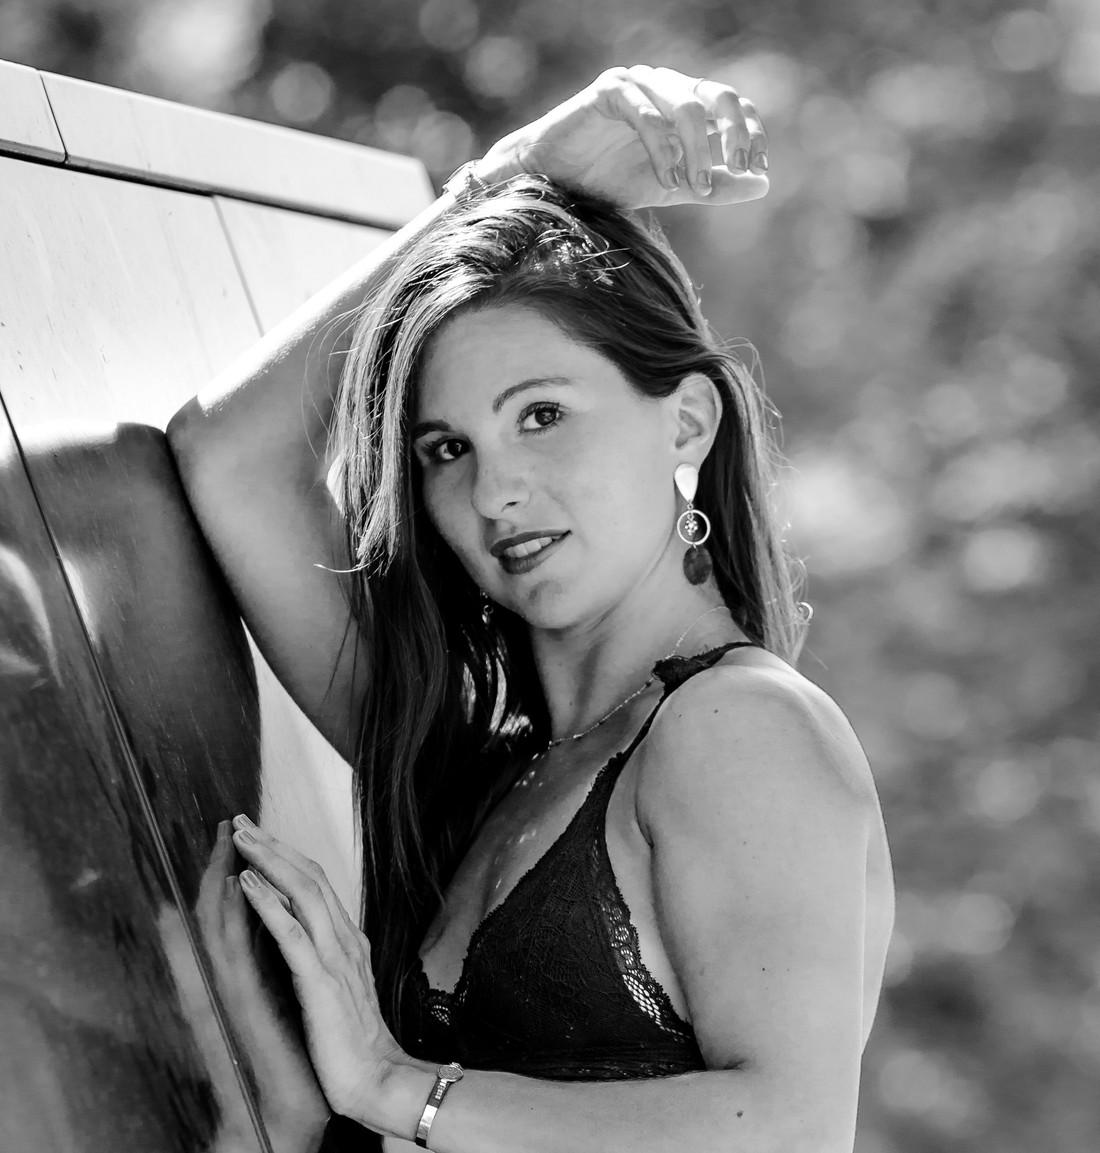 Alexia Launay